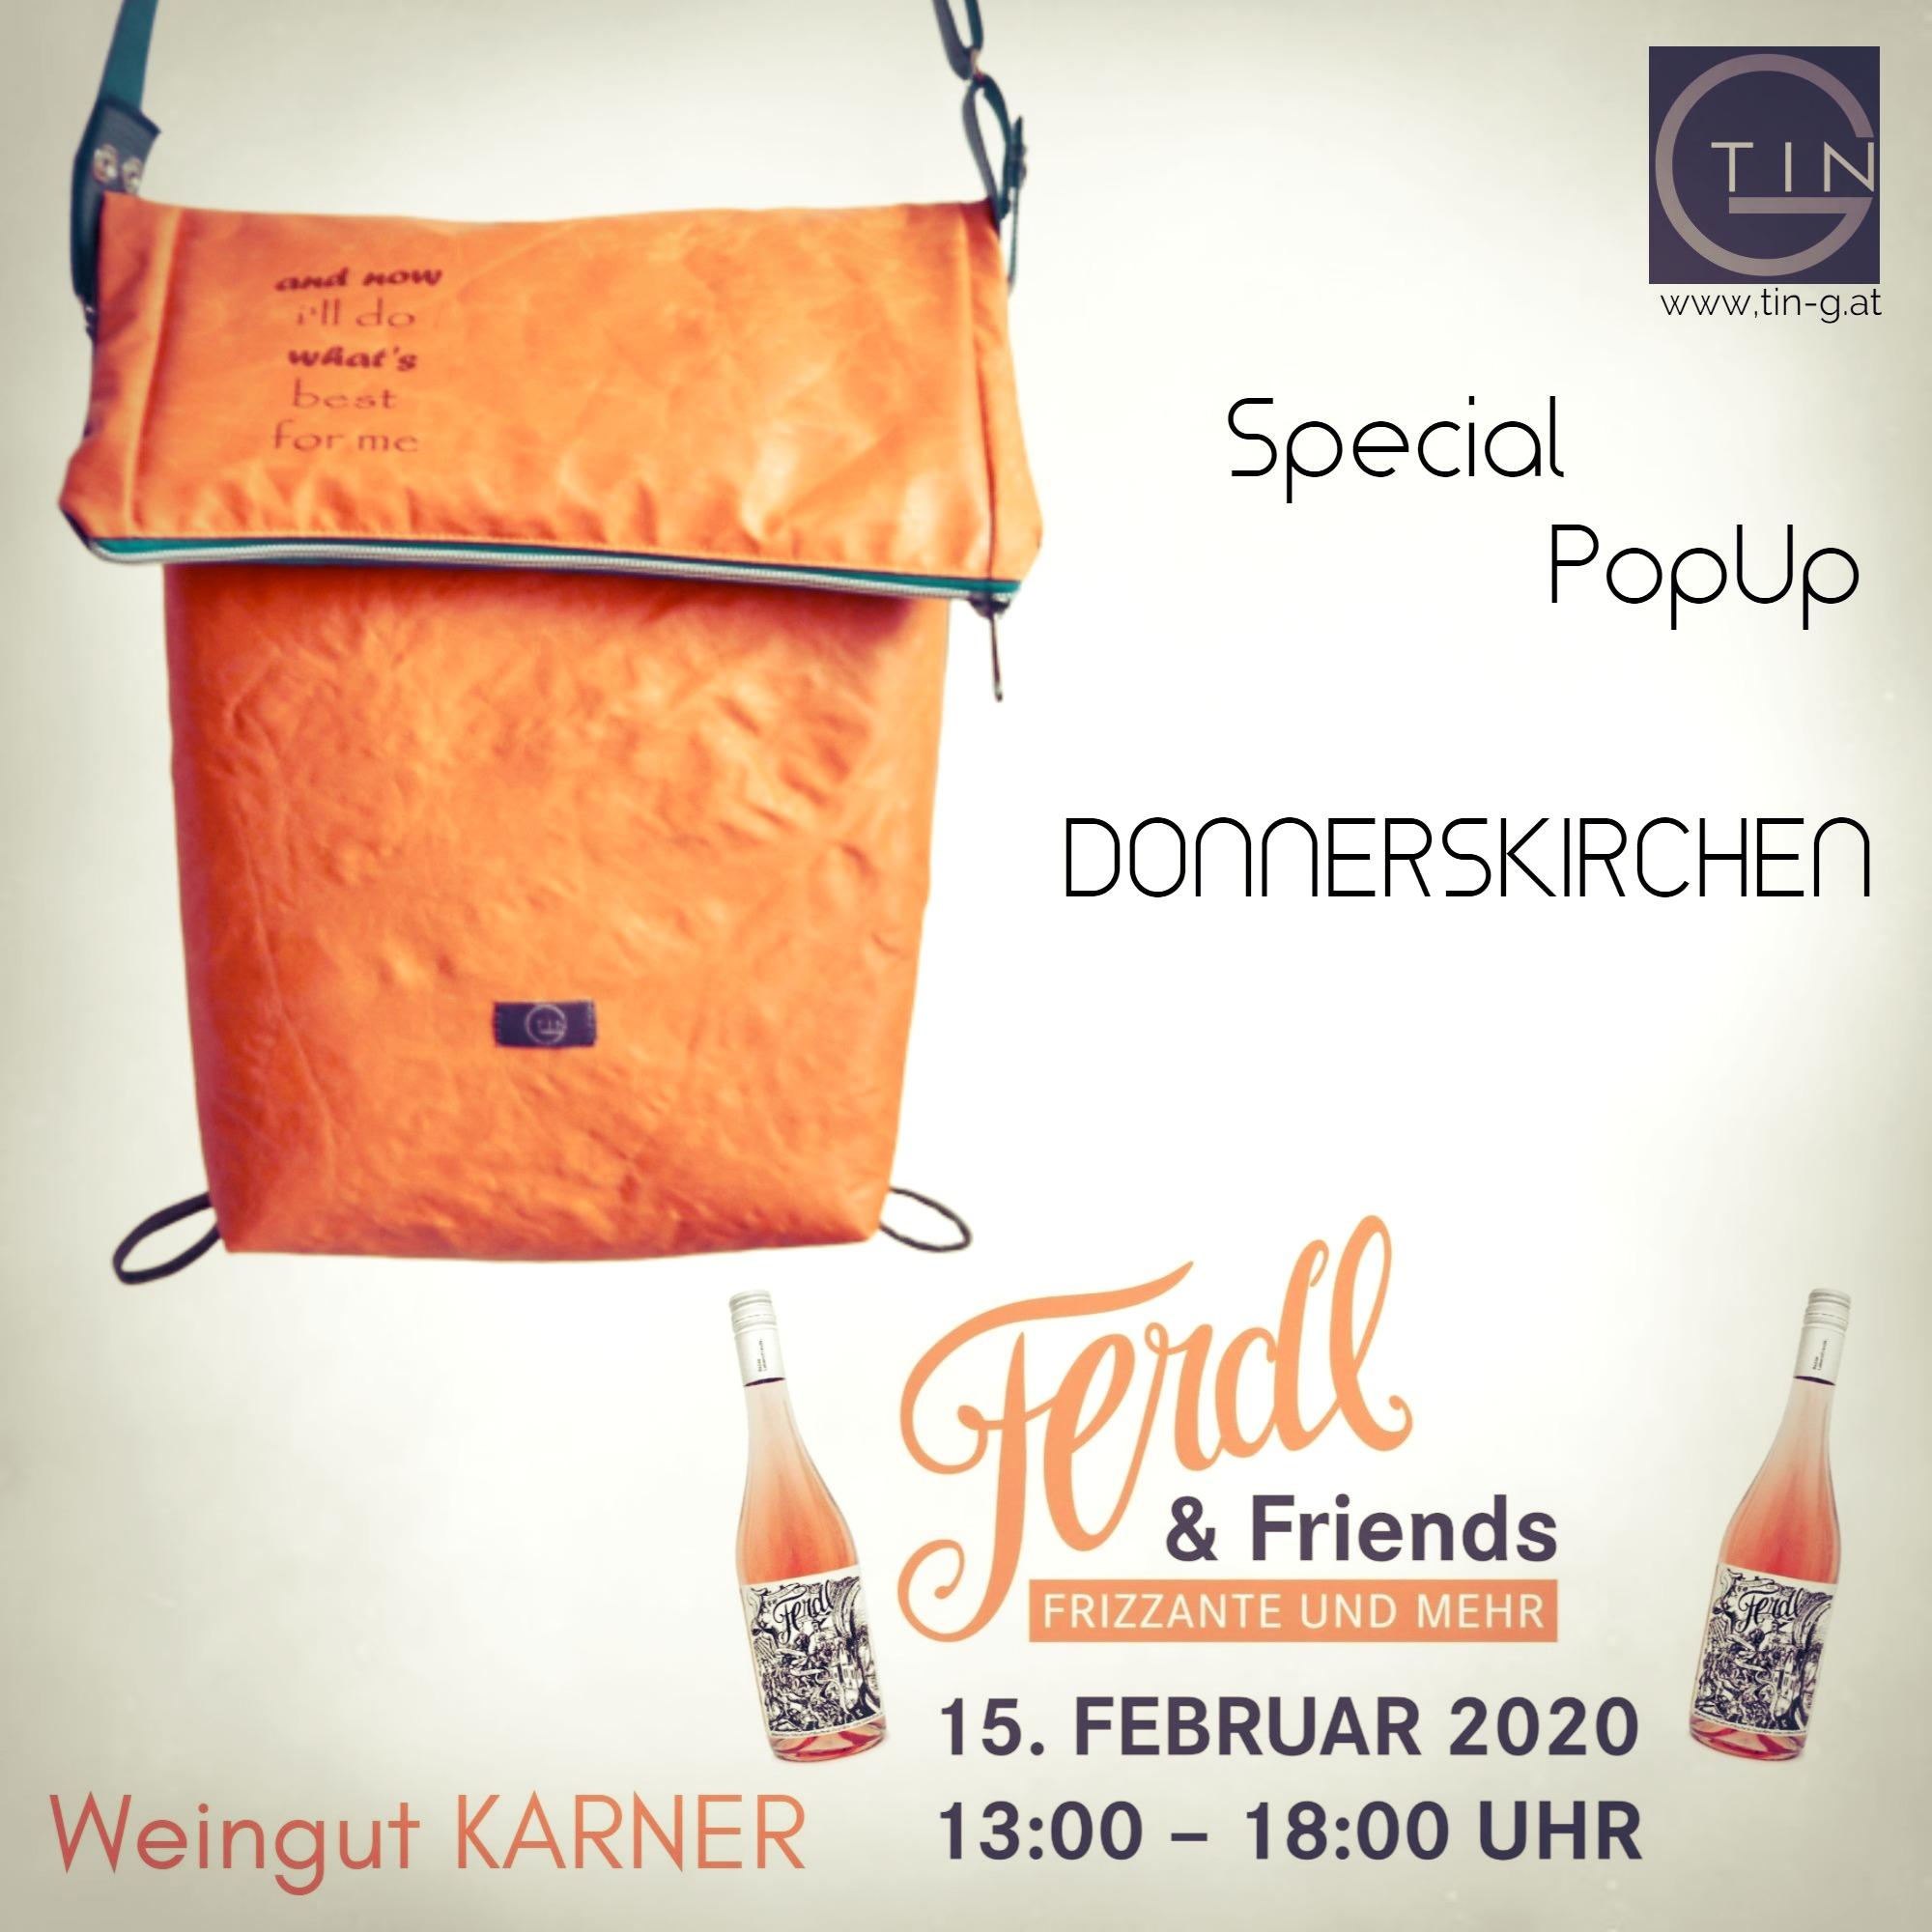 _Donnerskirchen_Karner (3)